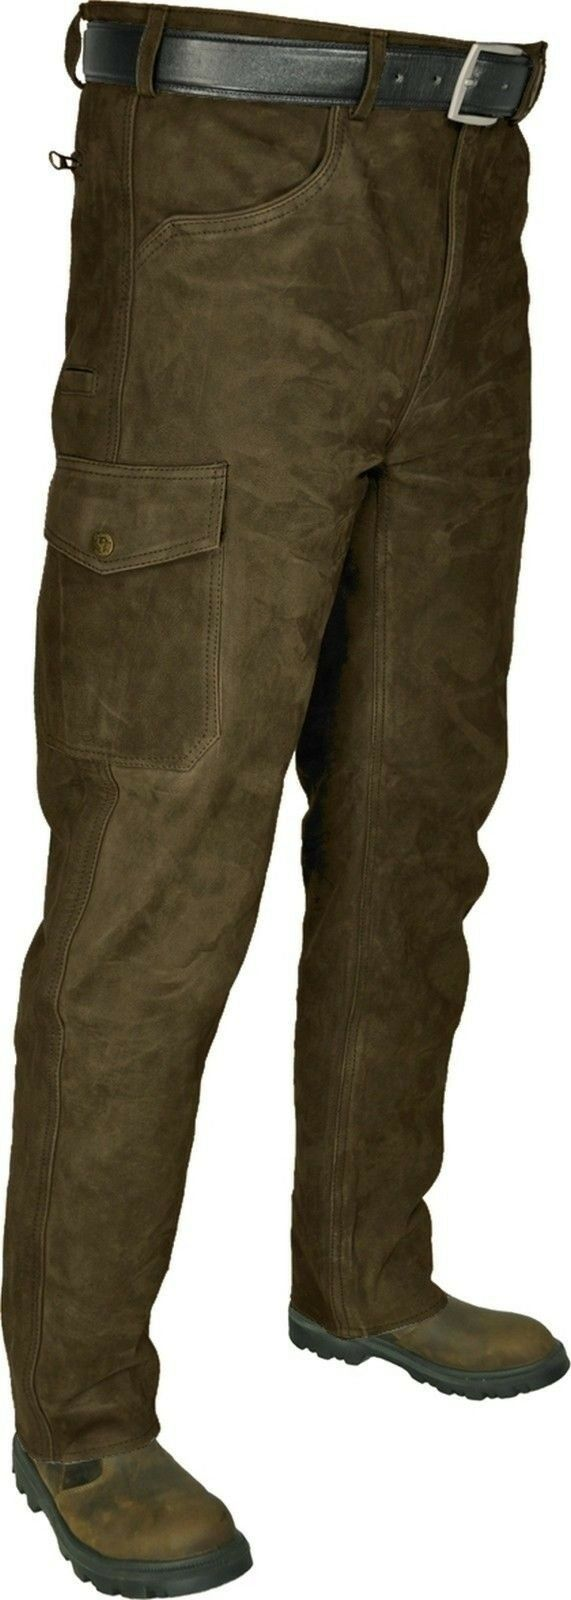 Lederhose ocio-caza pantalones Trachten semi cuero de búfalo marrón oscuro-verde oliva